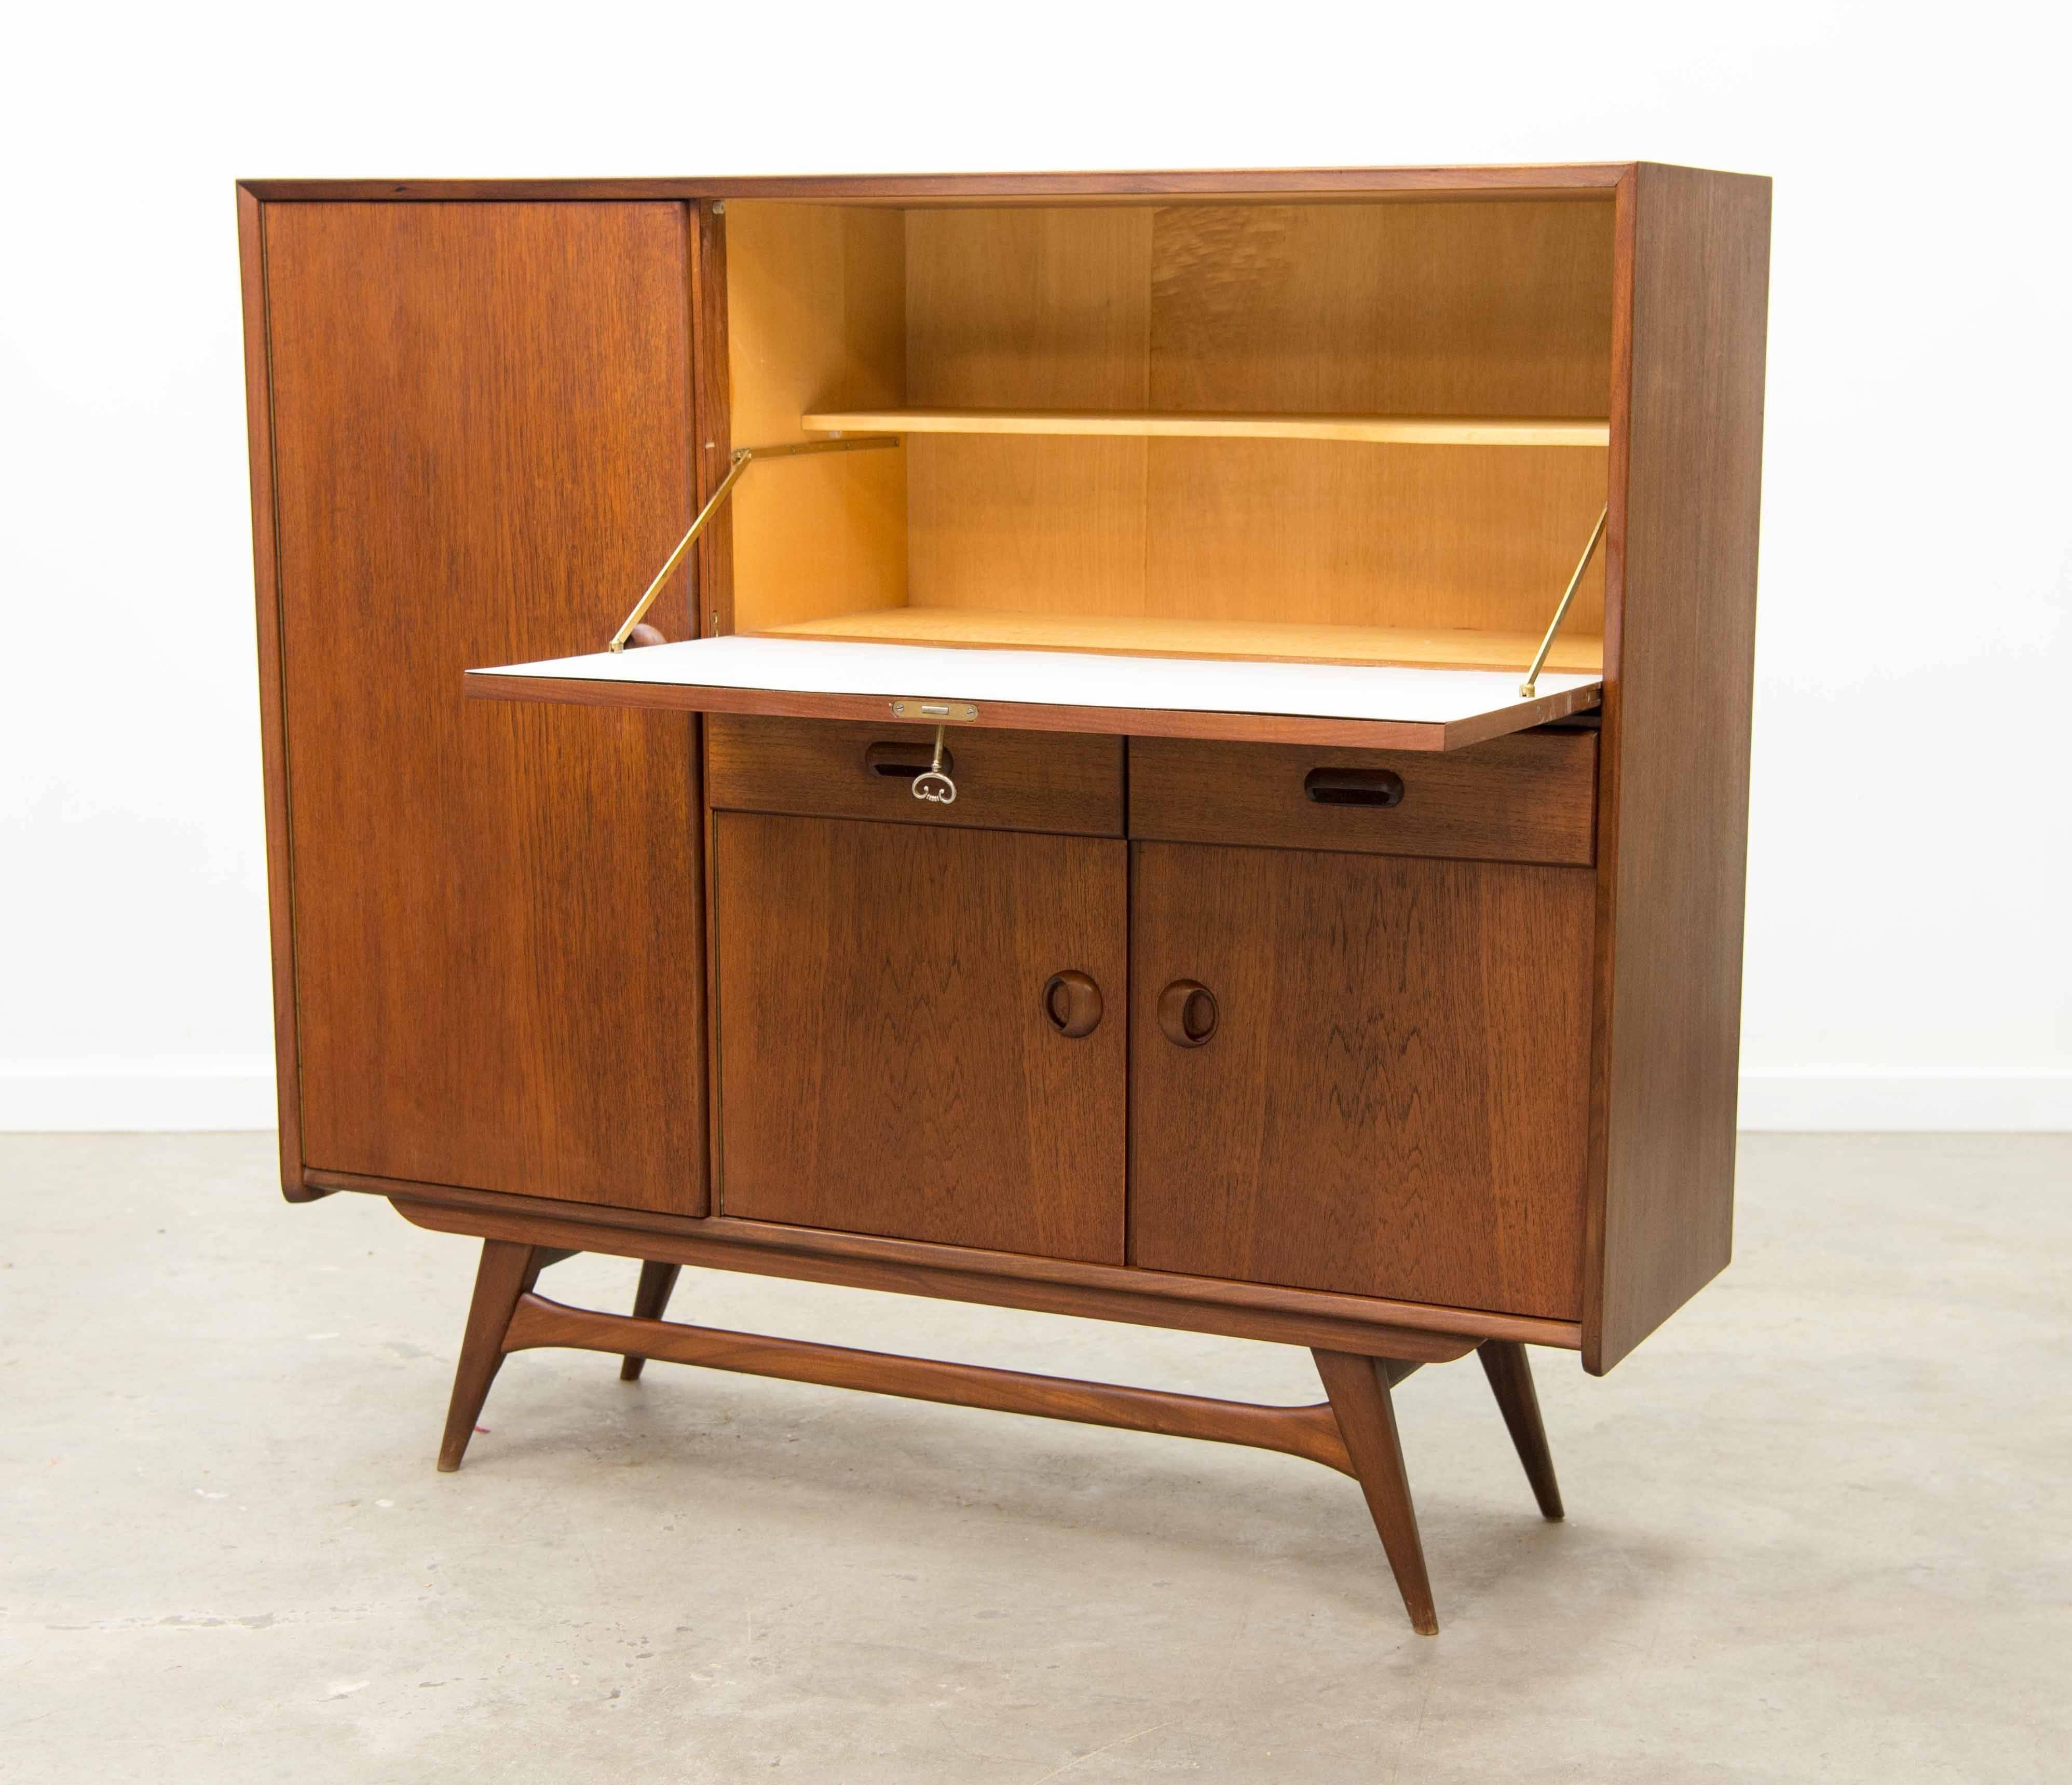 Delightful Mid Century Modern Louis Van Teeffelen For WeBe, Vintage Bar Cabinet, The  Netherlands